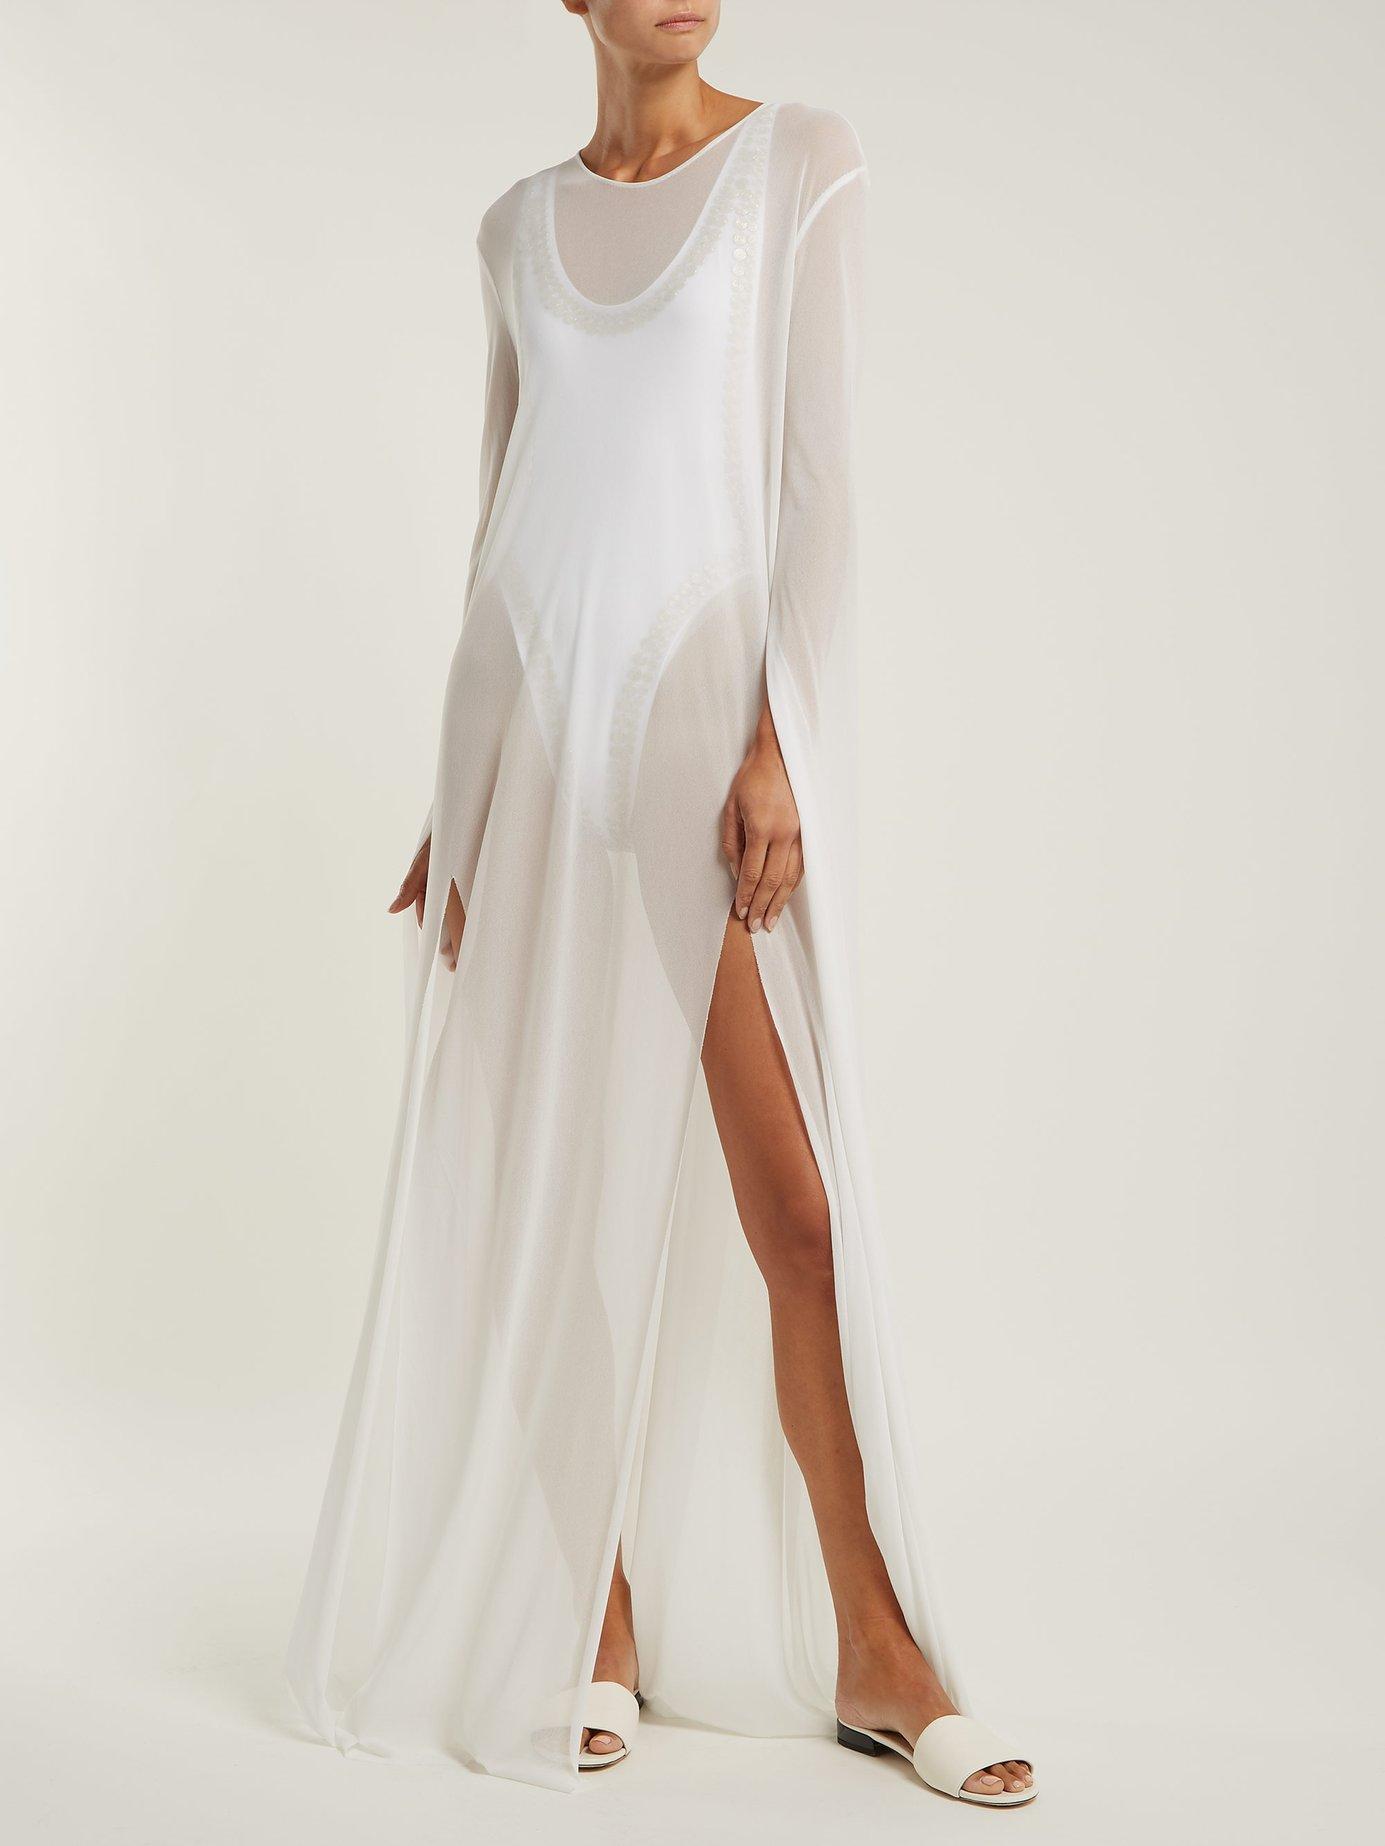 Ribbon-sleeve maxi dress by Norma Kamali